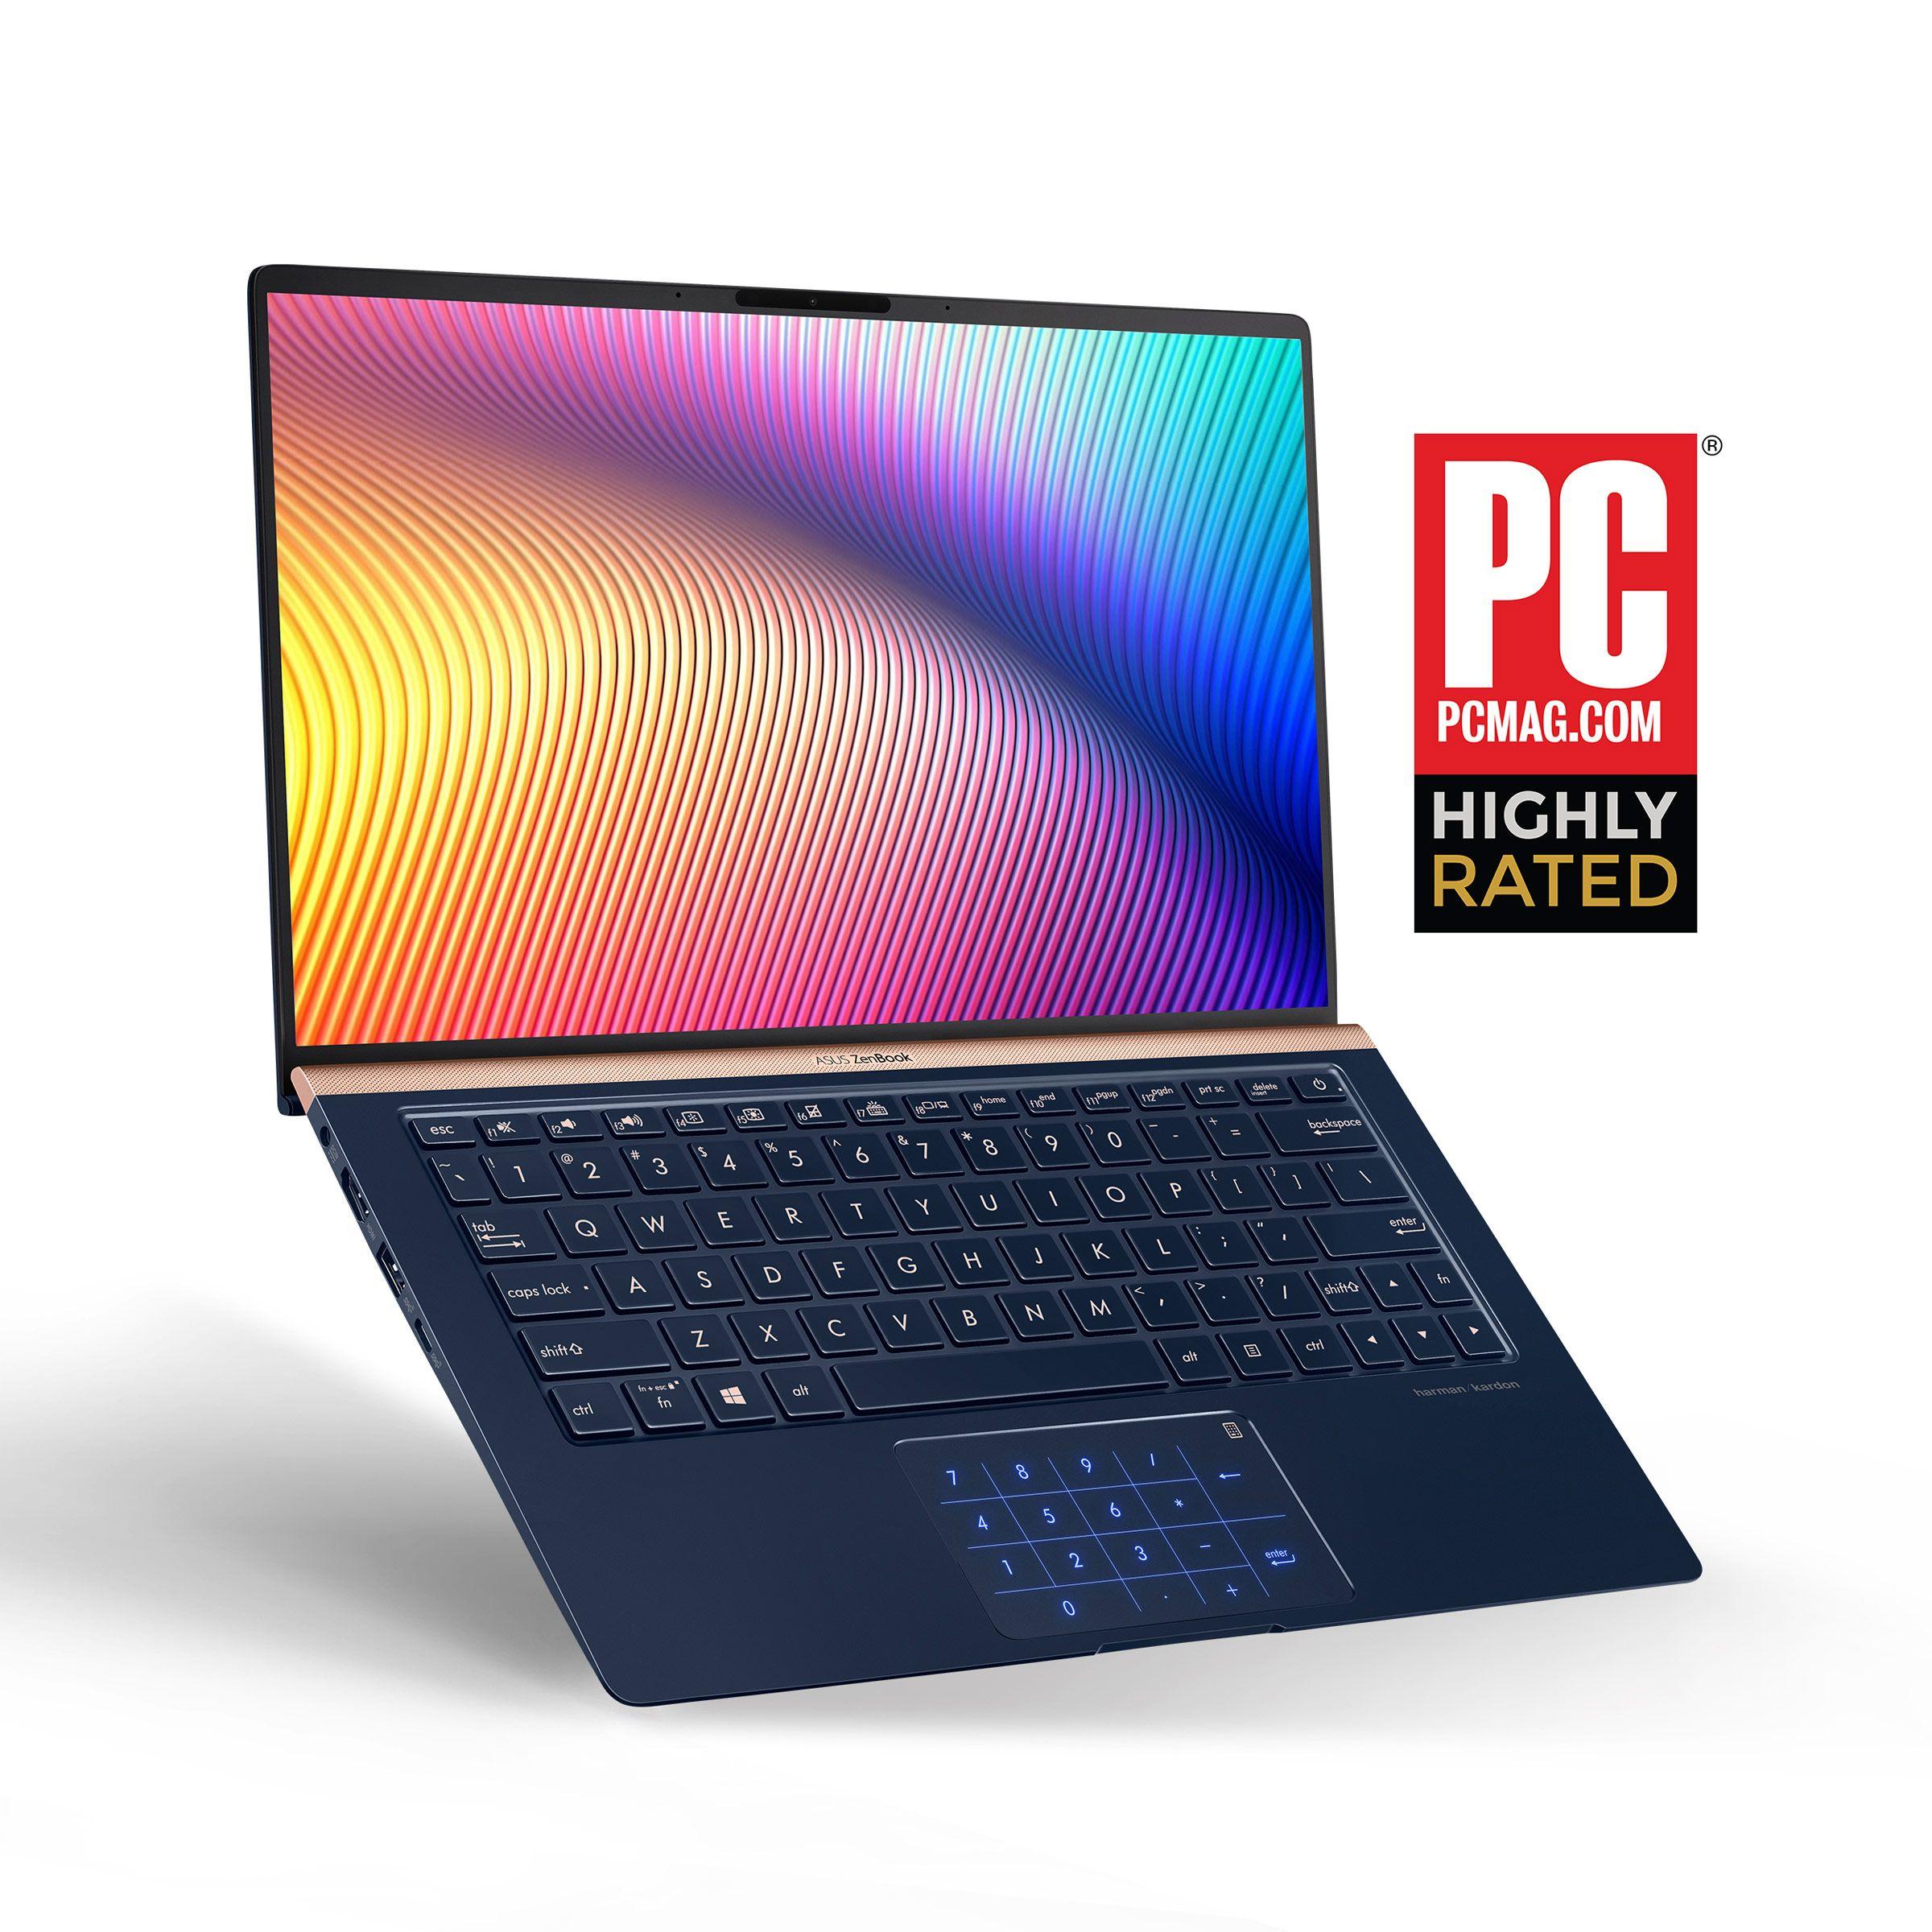 Asus Zenbook 14 Ux433fa Dh74 Ultra Slim Laptop 14 Full Hd 4 Way Nanoedge Bezel 8th Gen Intel Core I7 8565u Processor 16gb 512gb Pcie Ssd B Asus Intel Core Ssd